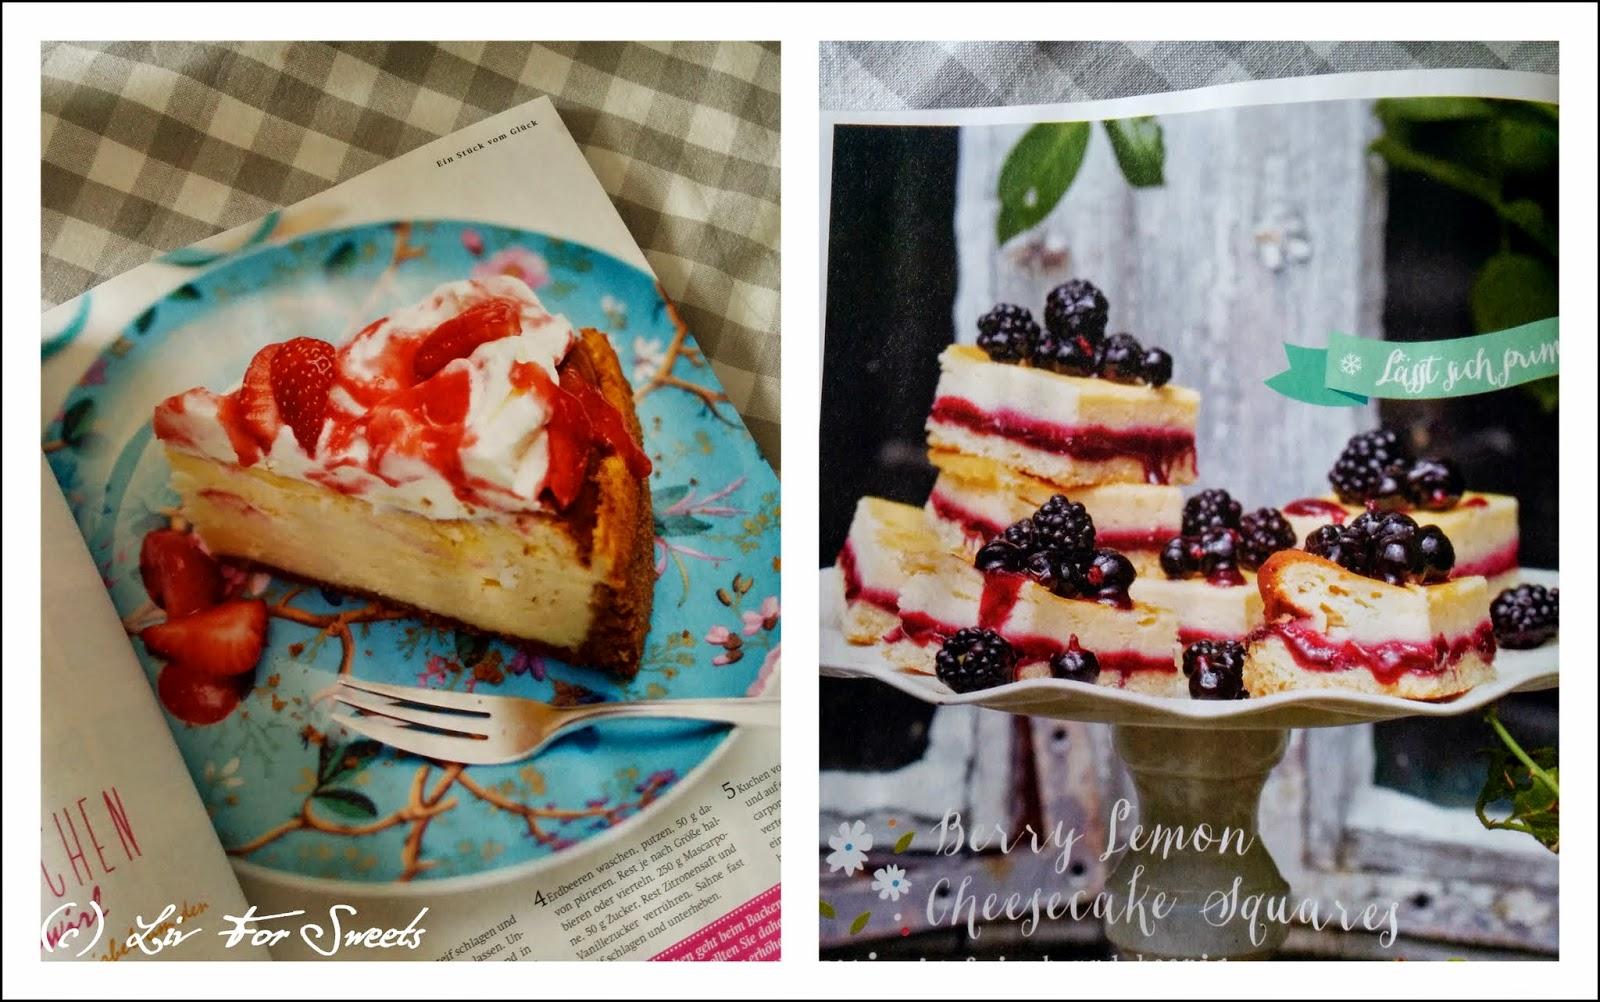 Rezepte aus Lecker Bakery | Mascarpone Käsekuchen | Berry Lemon Cheesecake Squares